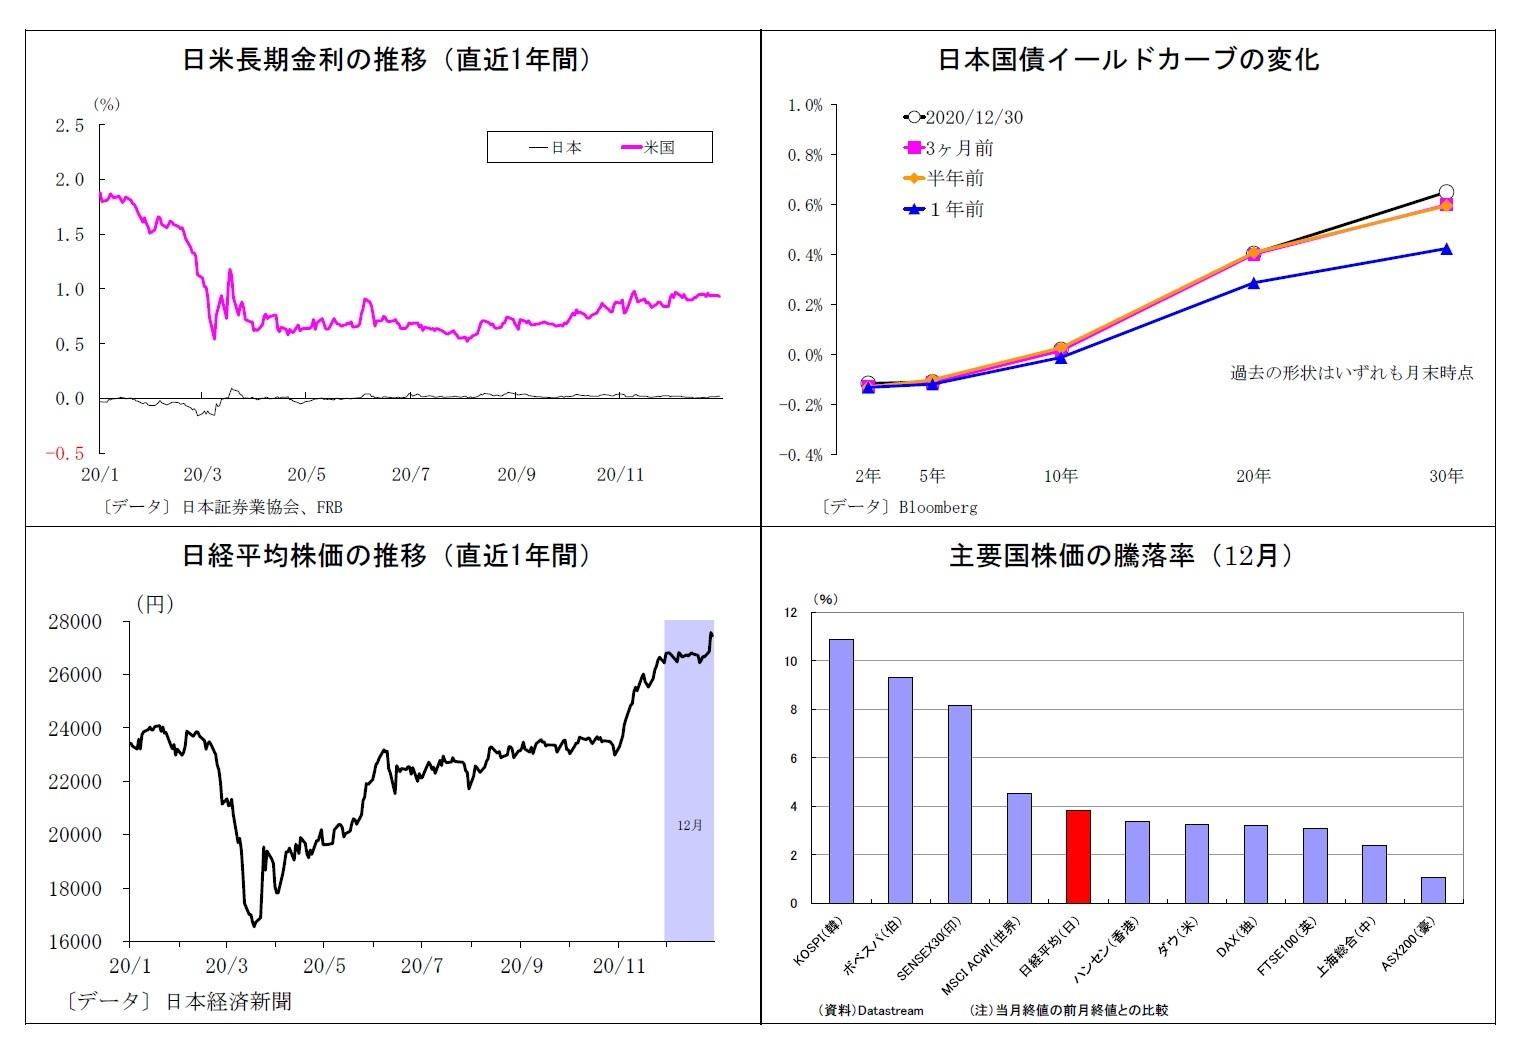 日米長期金利の推移(直近1年間)/日本国債イールドカーブの変化/日経平均株価の推移(直近1年間)/主要国株価の騰落率(12月)